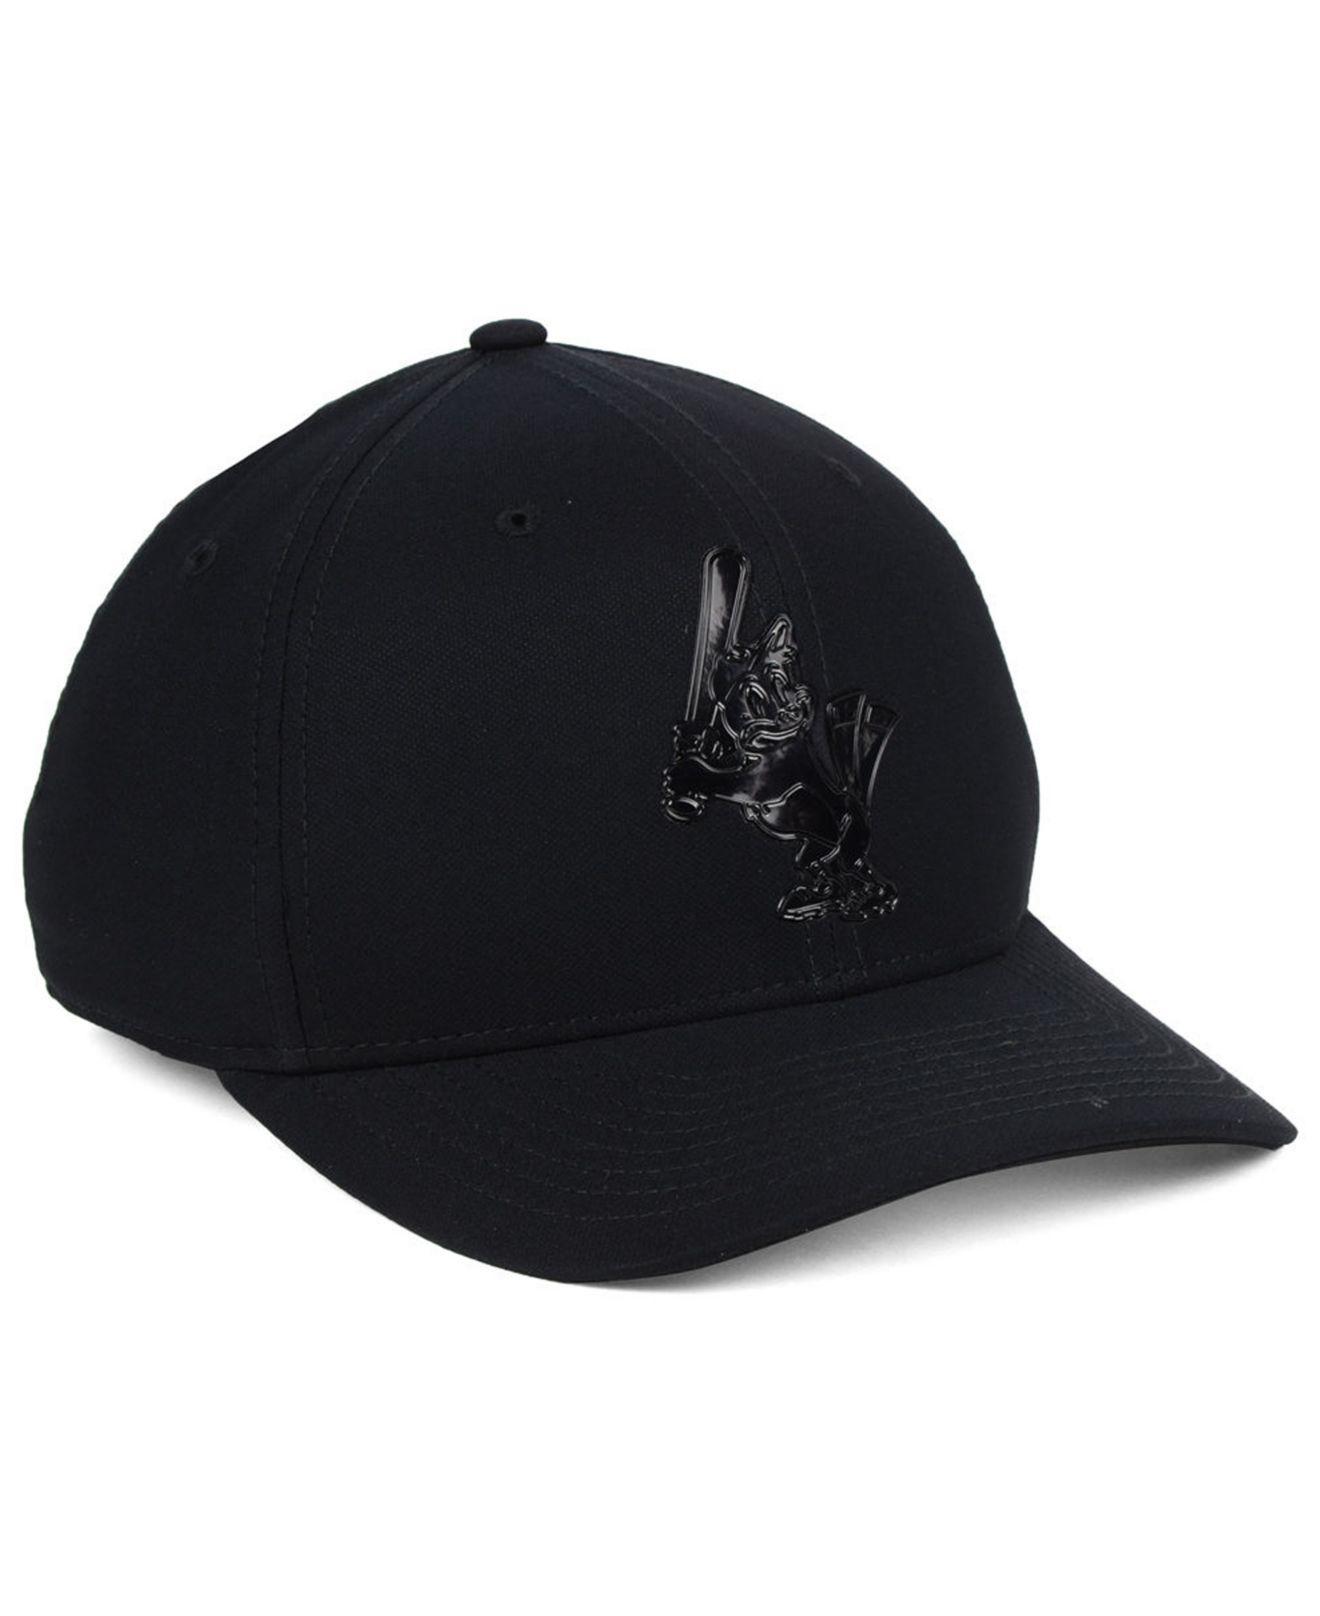 release date 19e3e e8116 Nike - Black Baltimore Orioles Gloss Swooshflex Cap for Men - Lyst. View  fullscreen